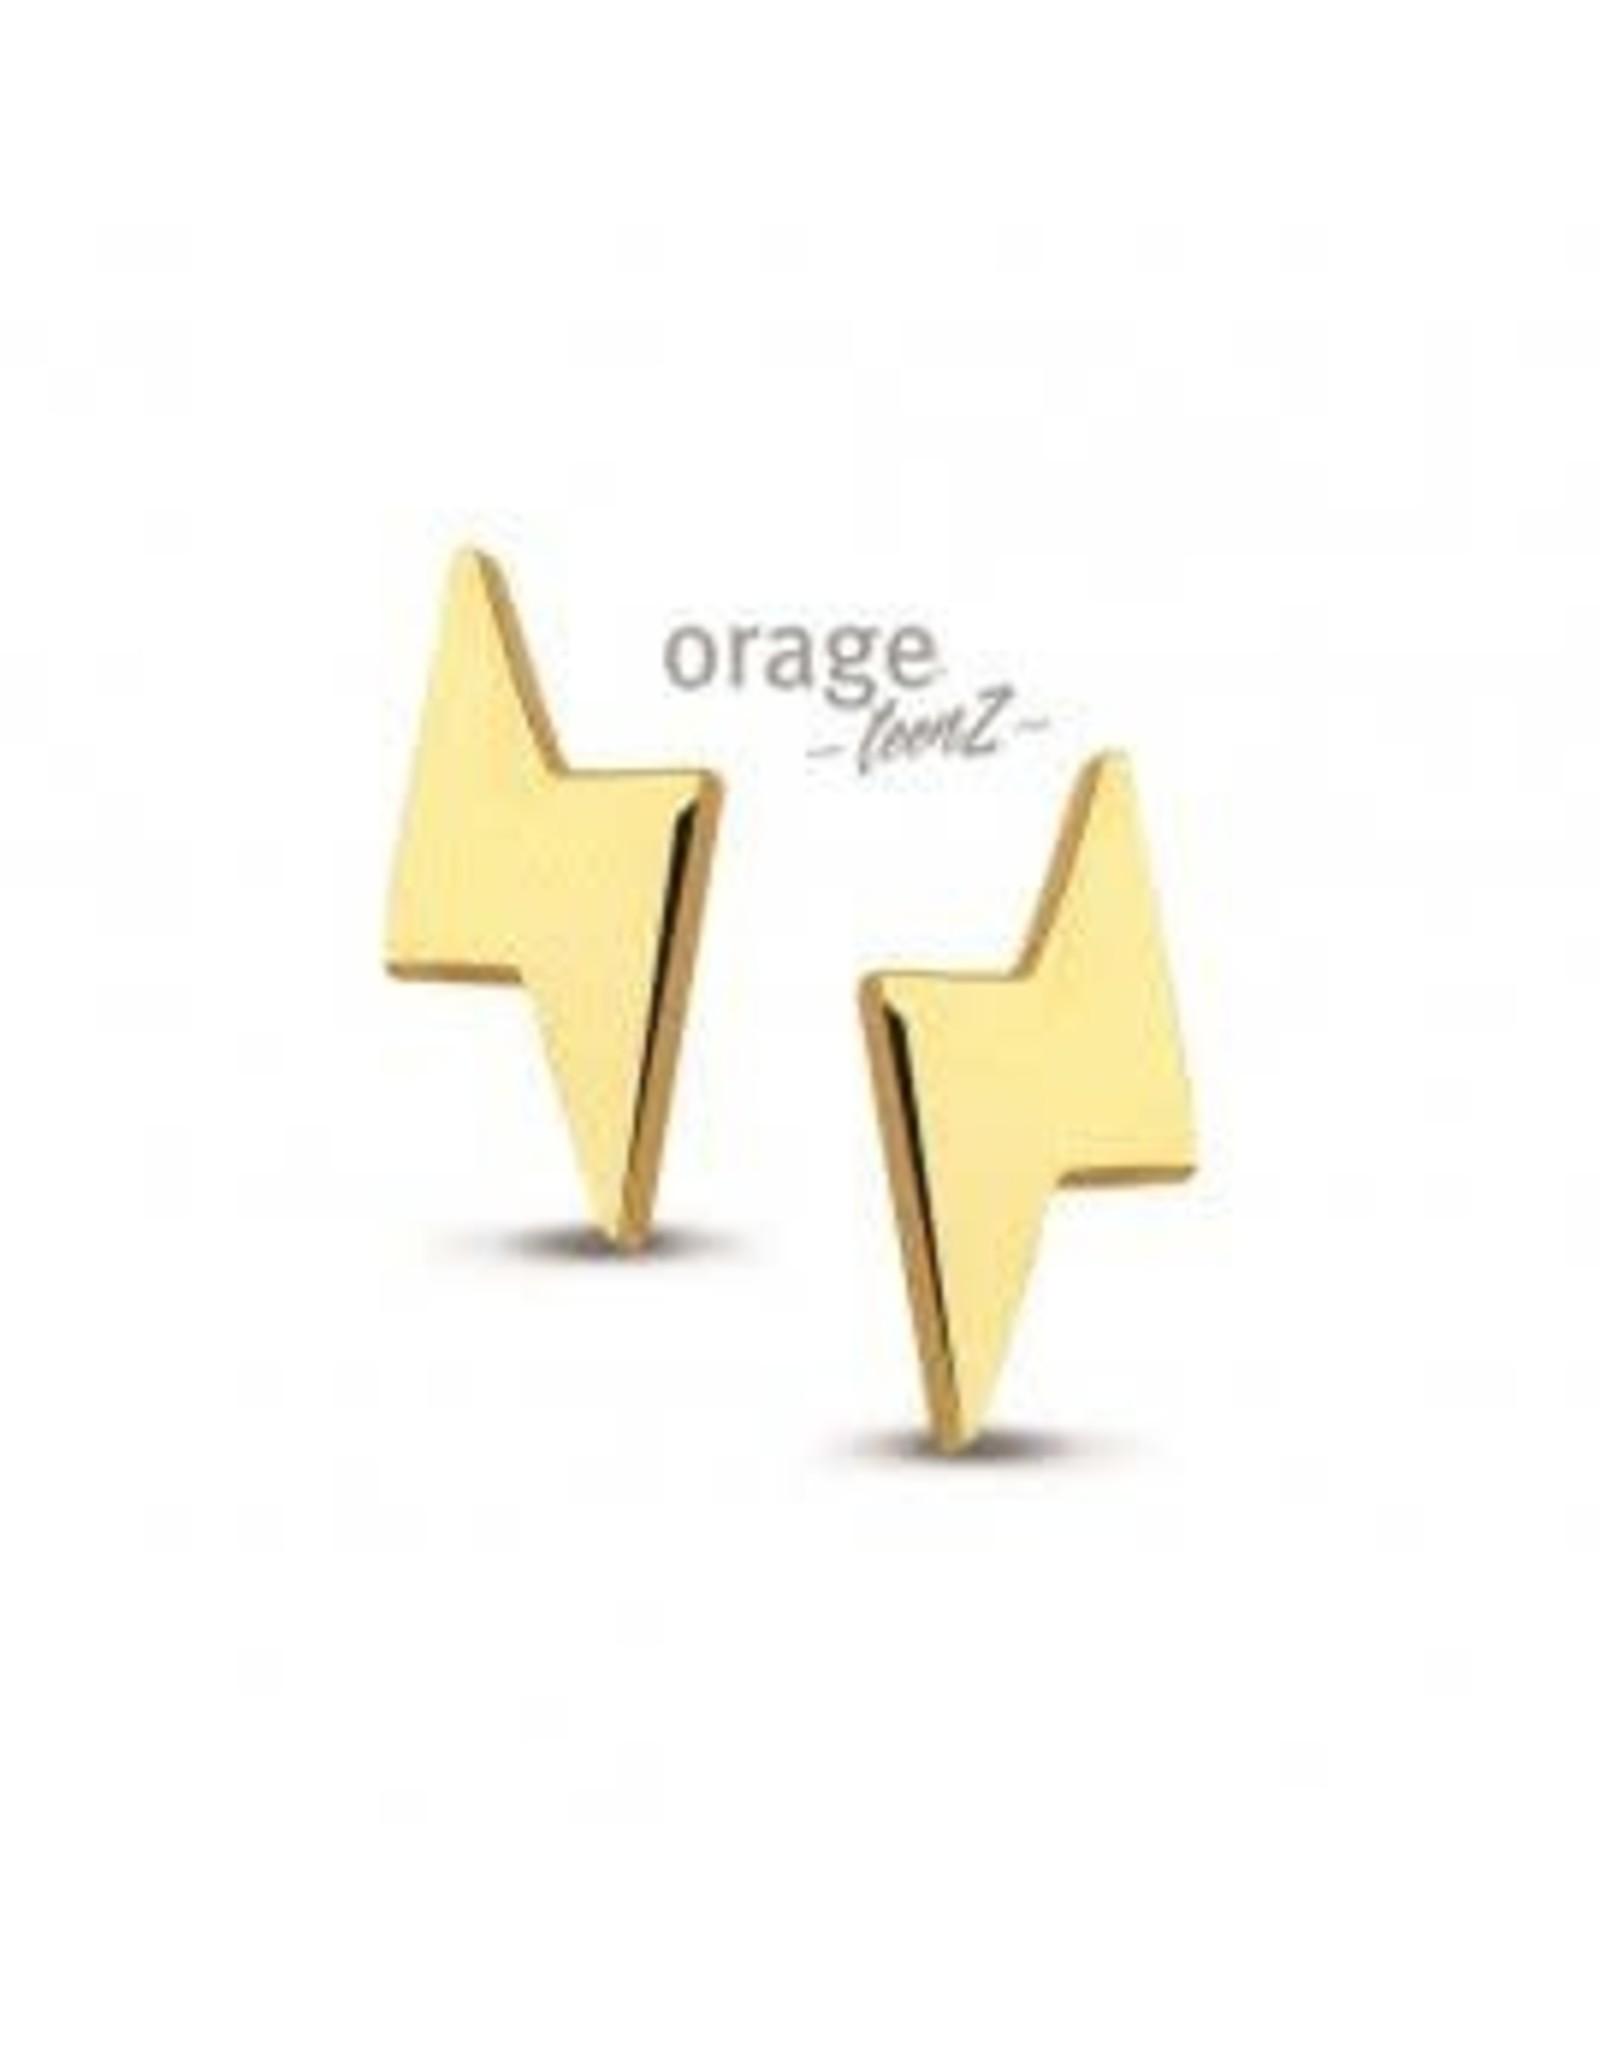 Orage Teenz Oorbellen Orage Teenz Staal goudkleurig T005